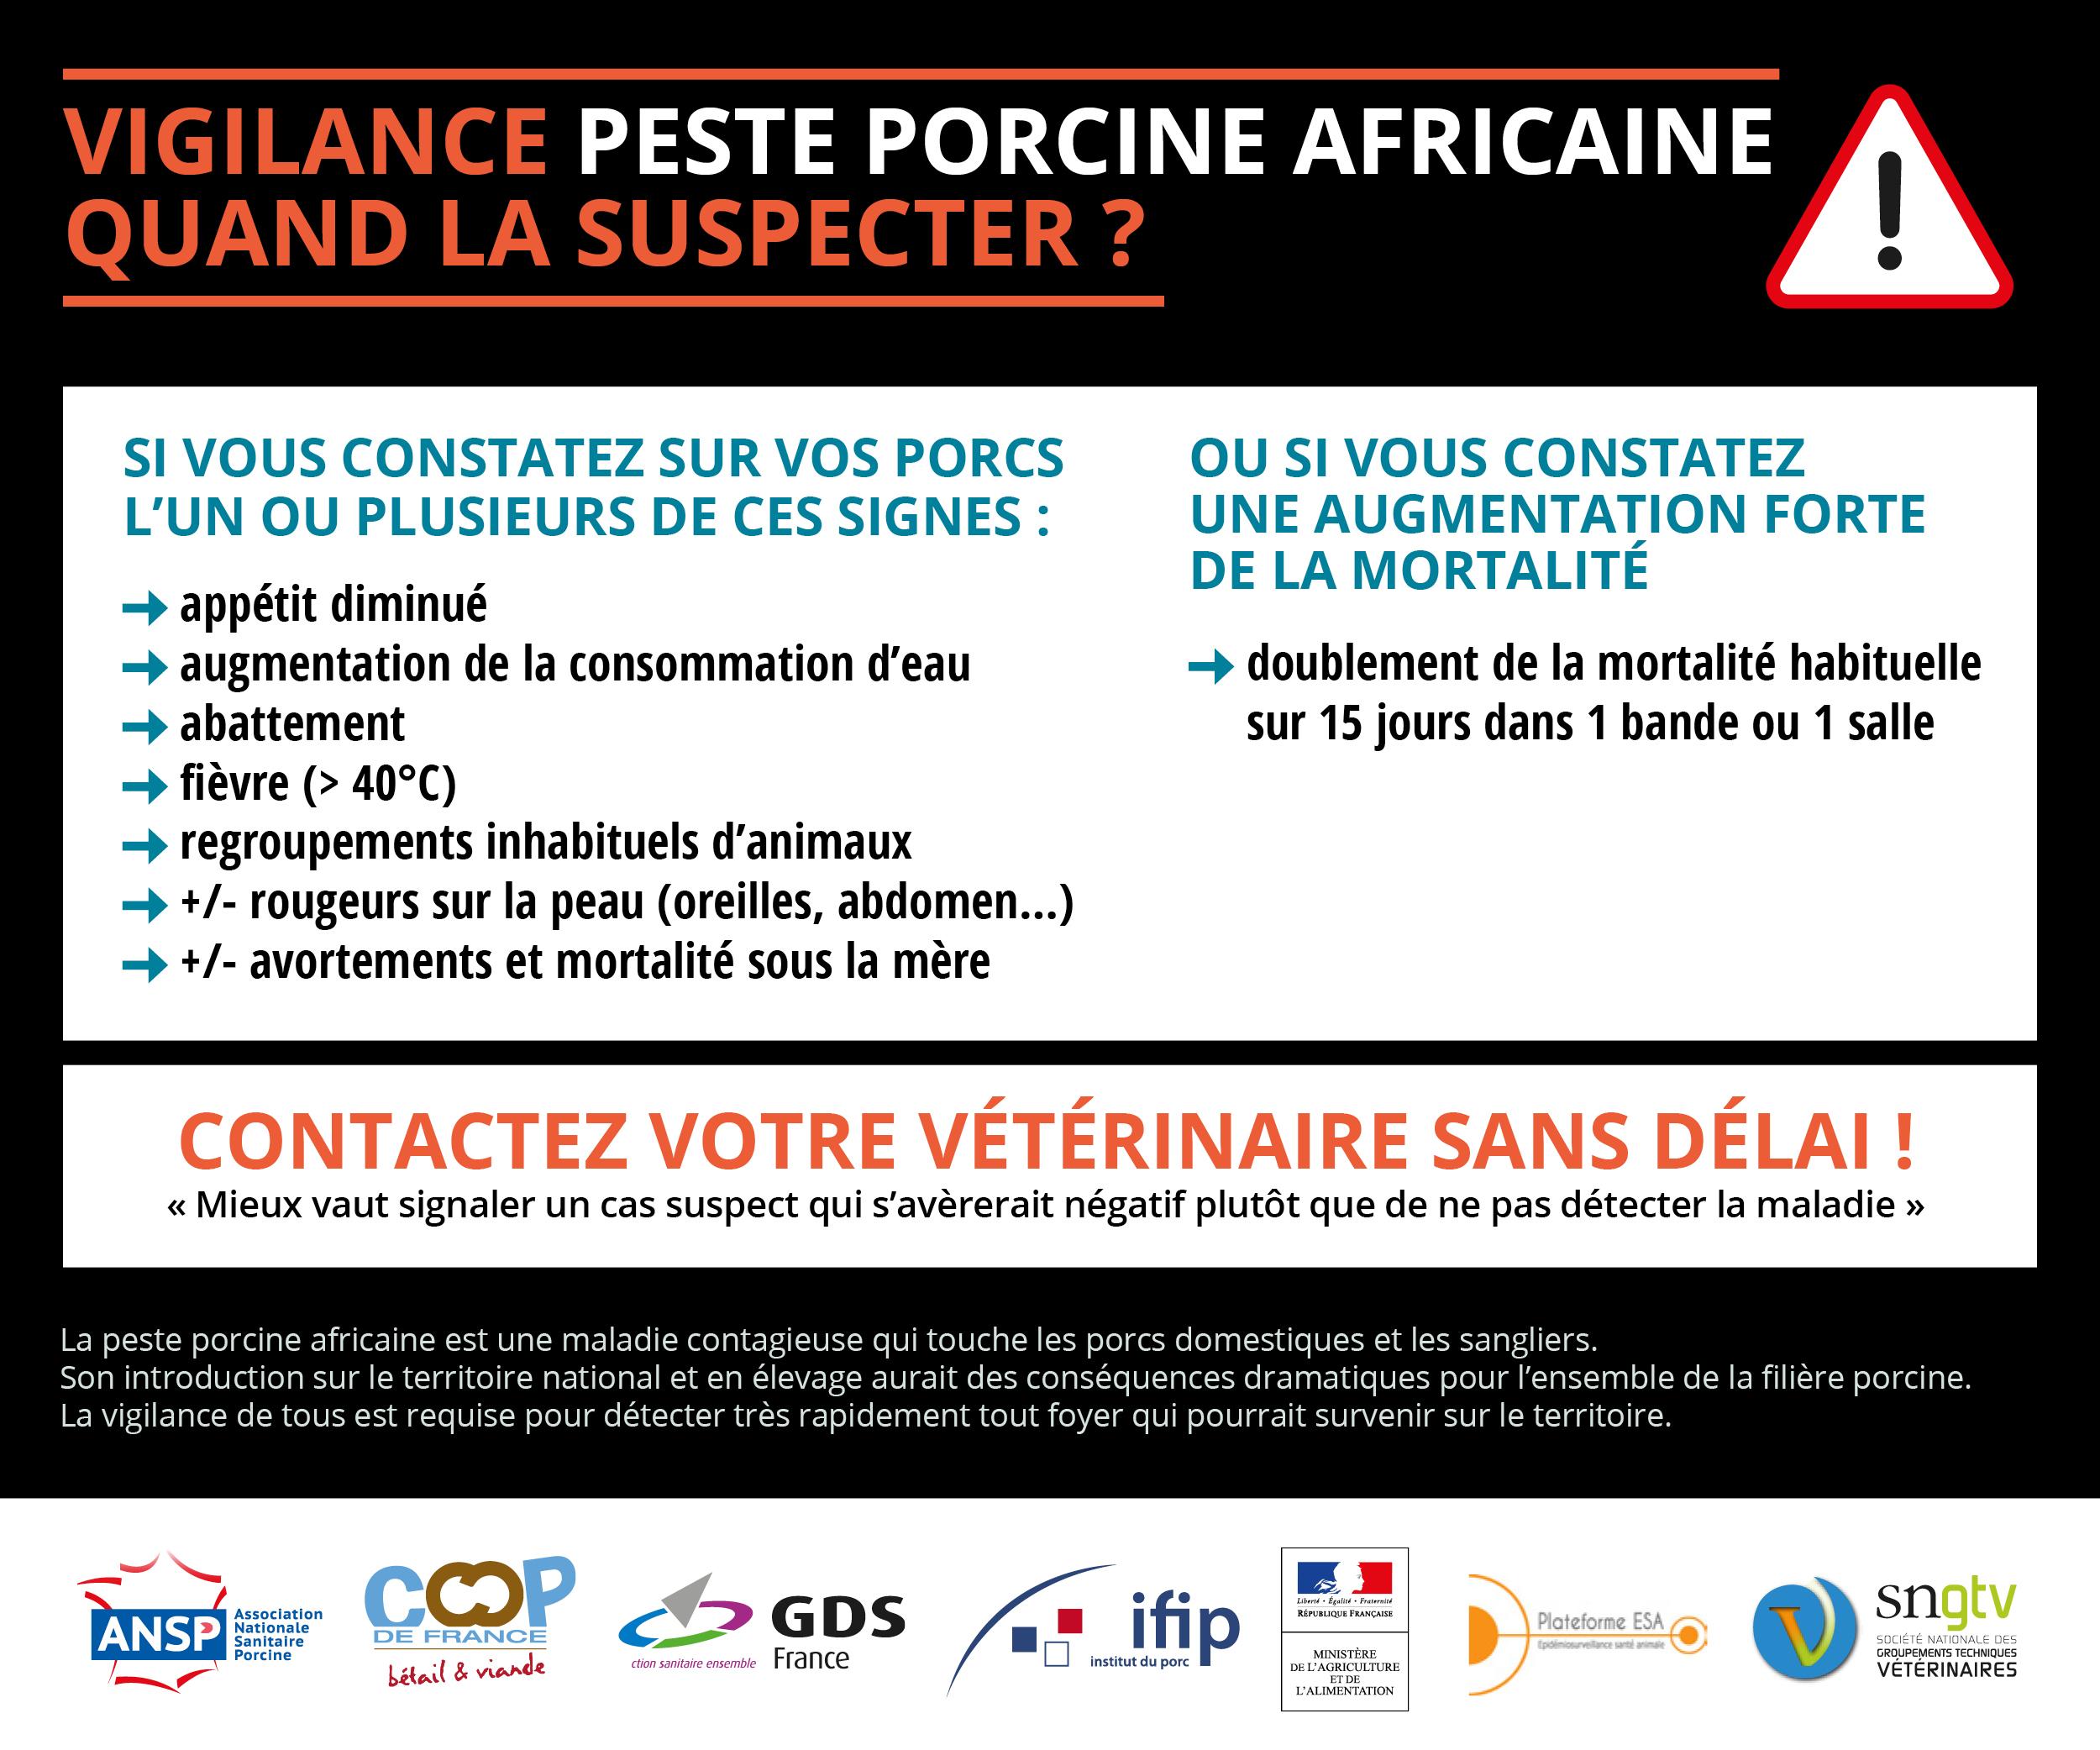 Vigiliance PPA (peste porcine africaine)